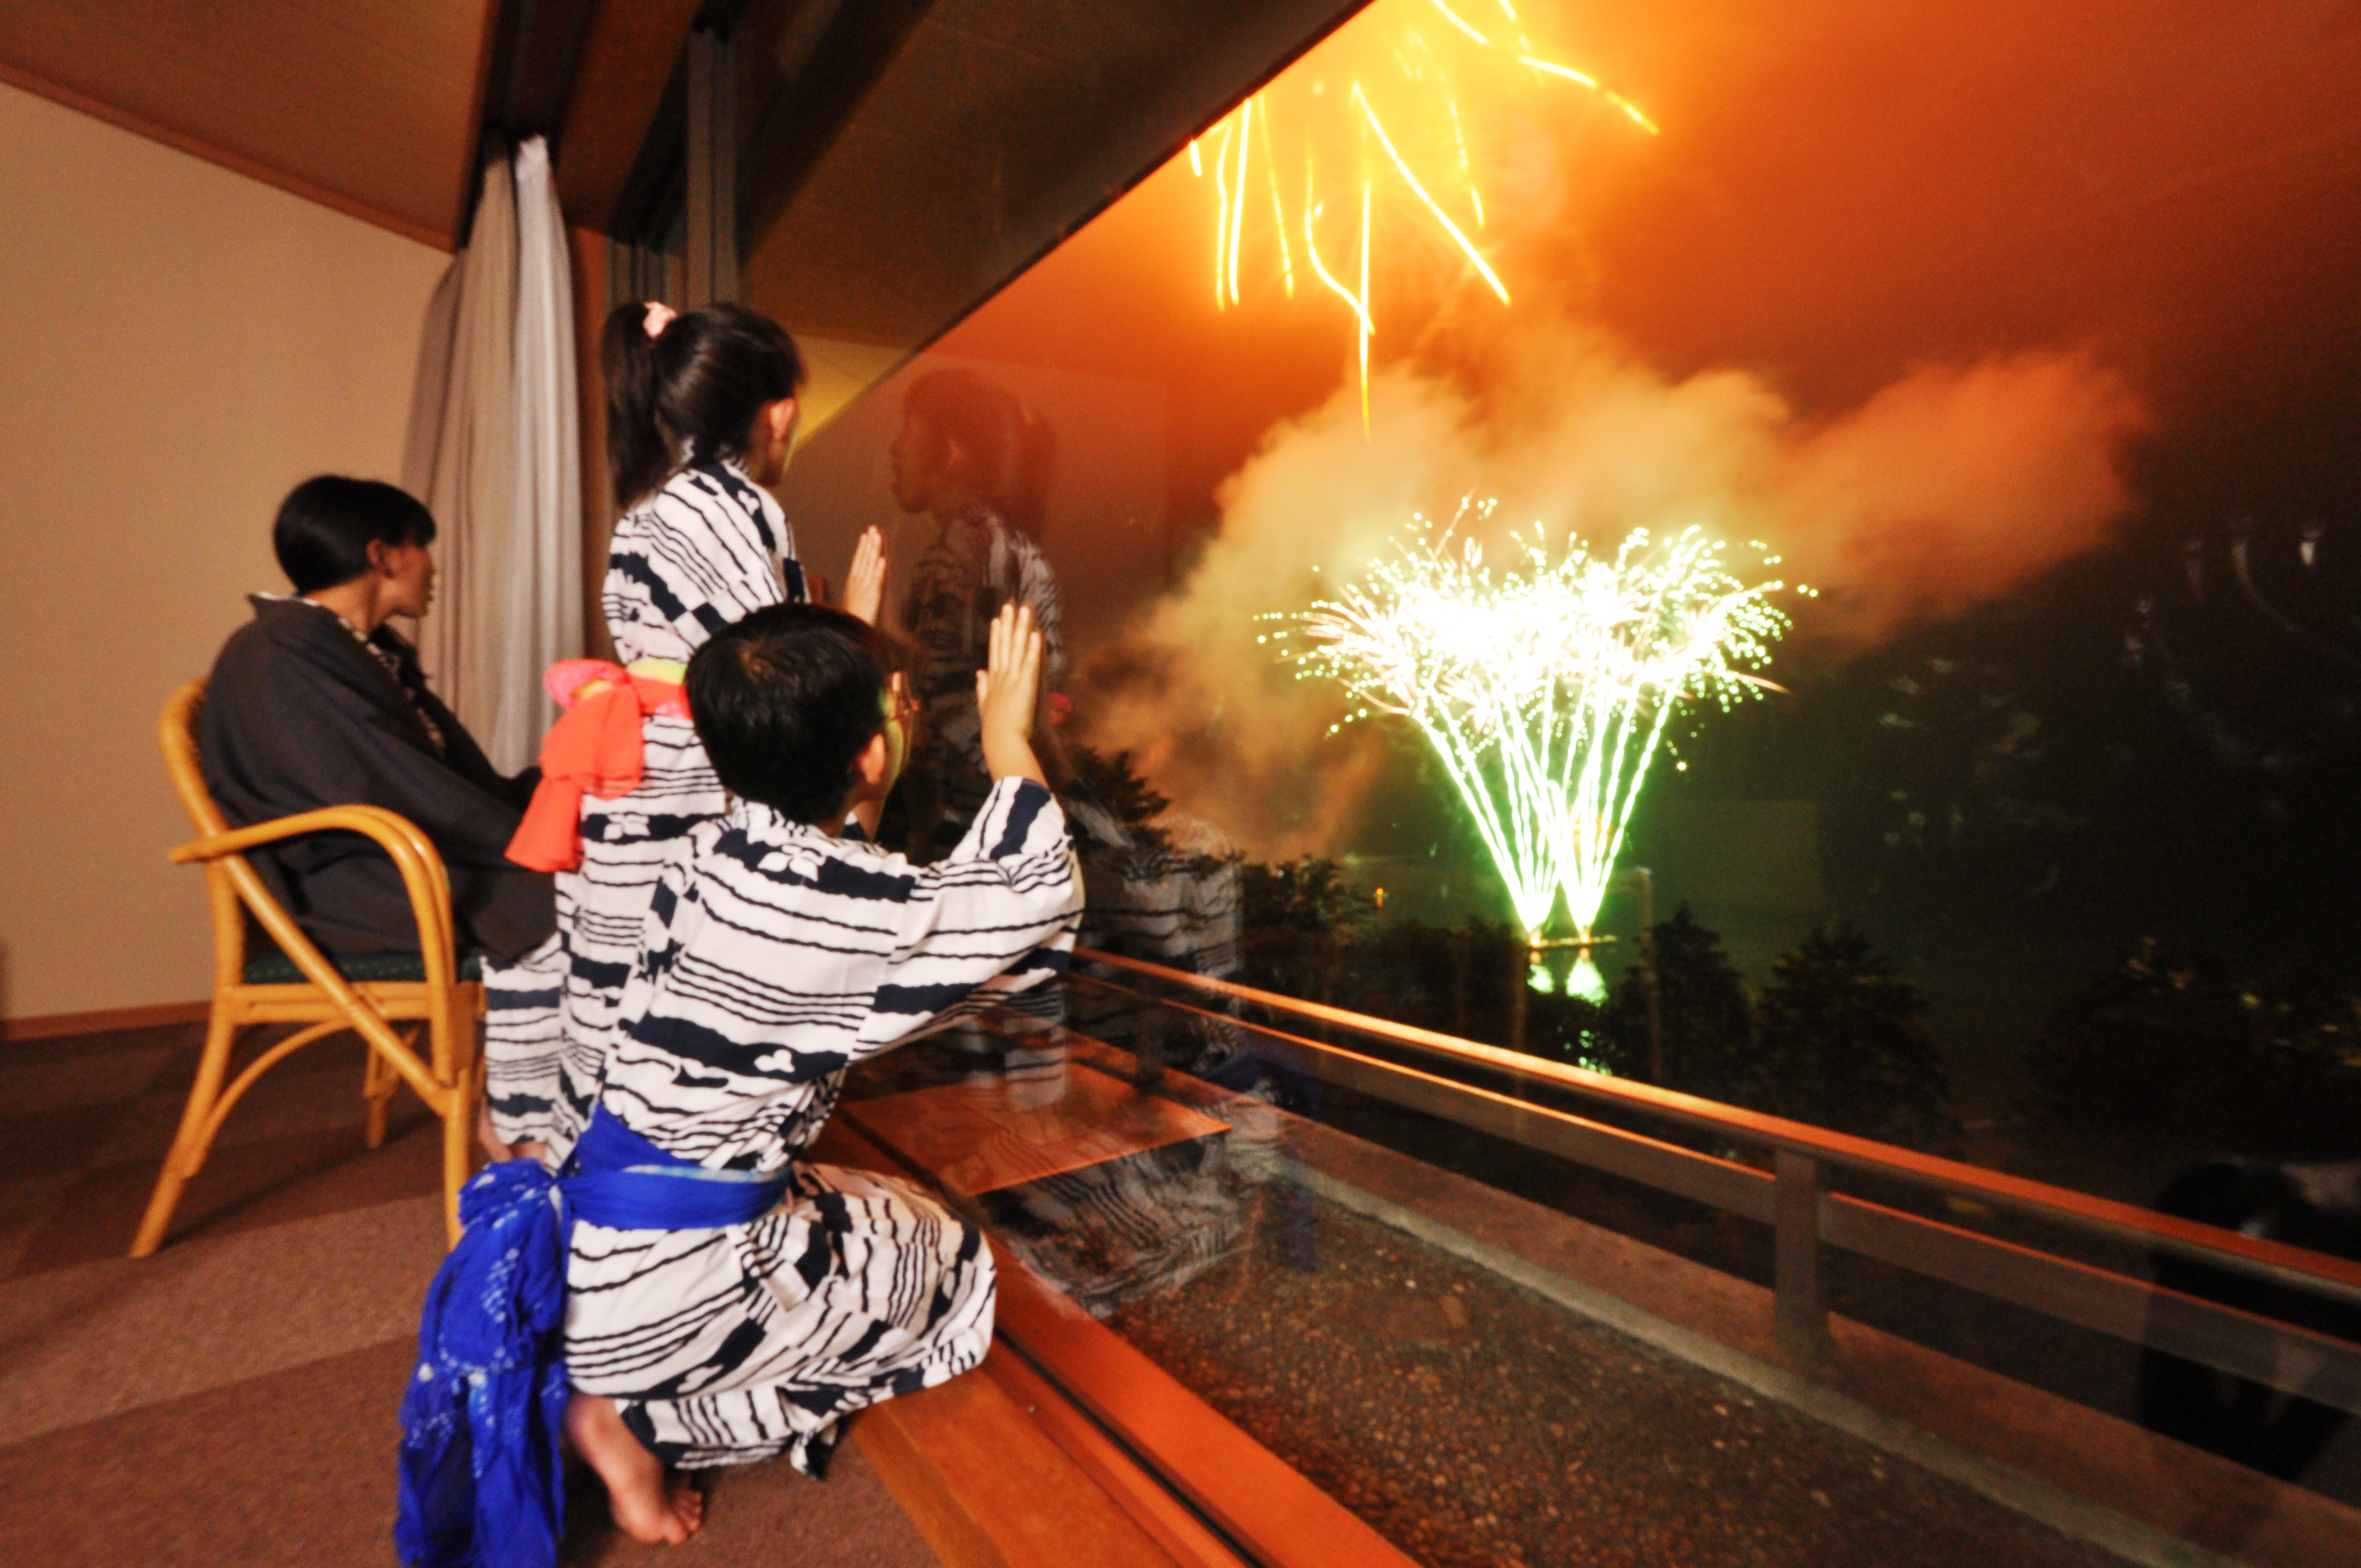 Enjoy viewing beautiful fireworks at Ryuguden Ryokan in Hakone - Fireworks at Ashinoko, Hakone (Photo: Business Wire)